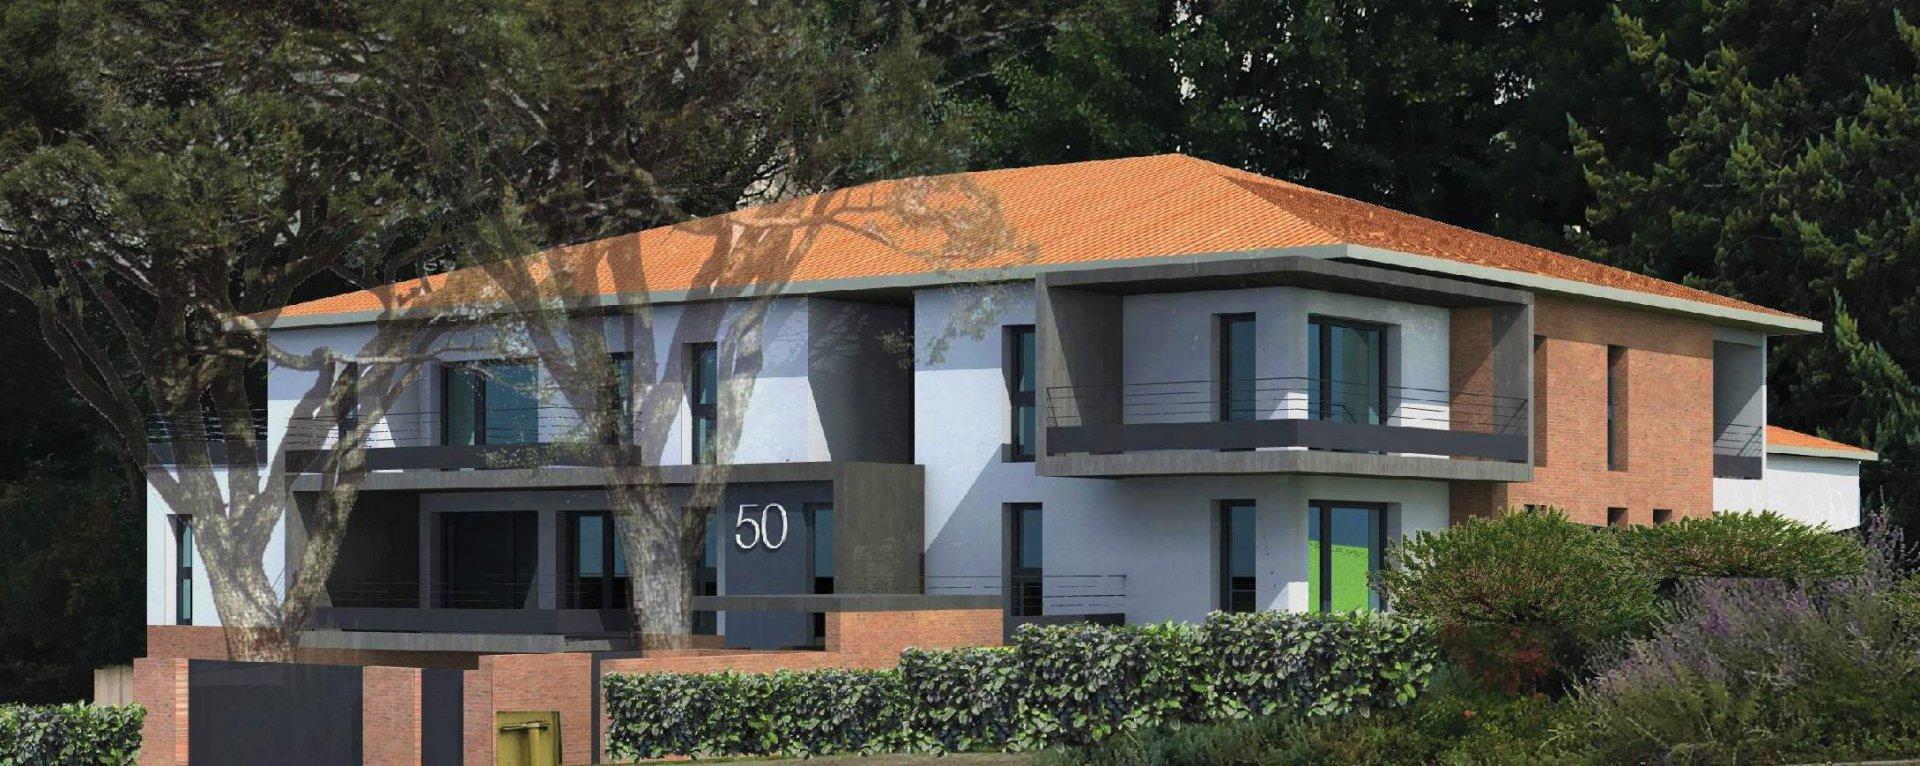 Appartement T3 - 65m² avec grande terrasse - 31850 MONTRABE